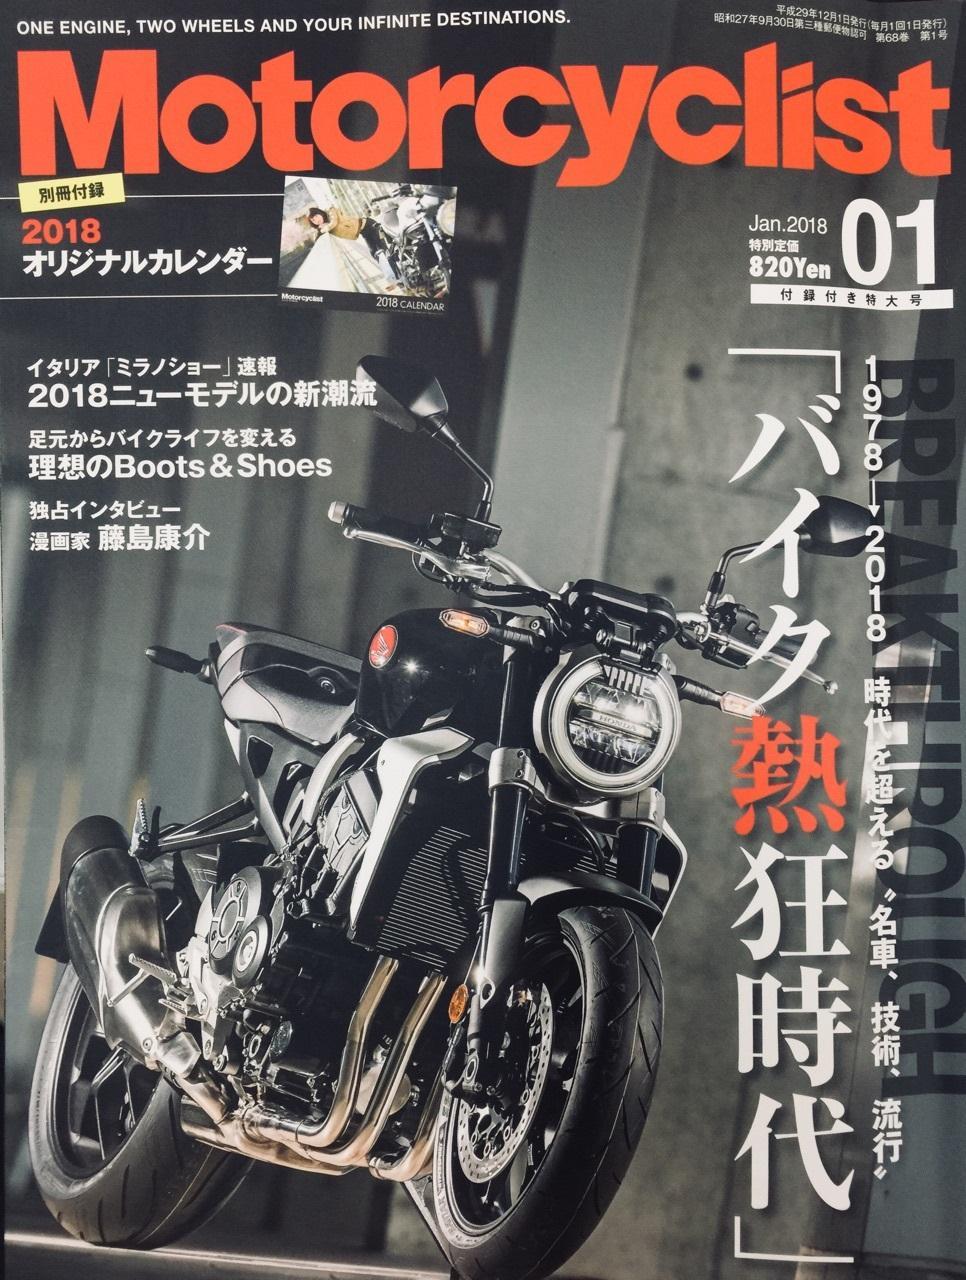 Motorcyclist★1月号(^^)★